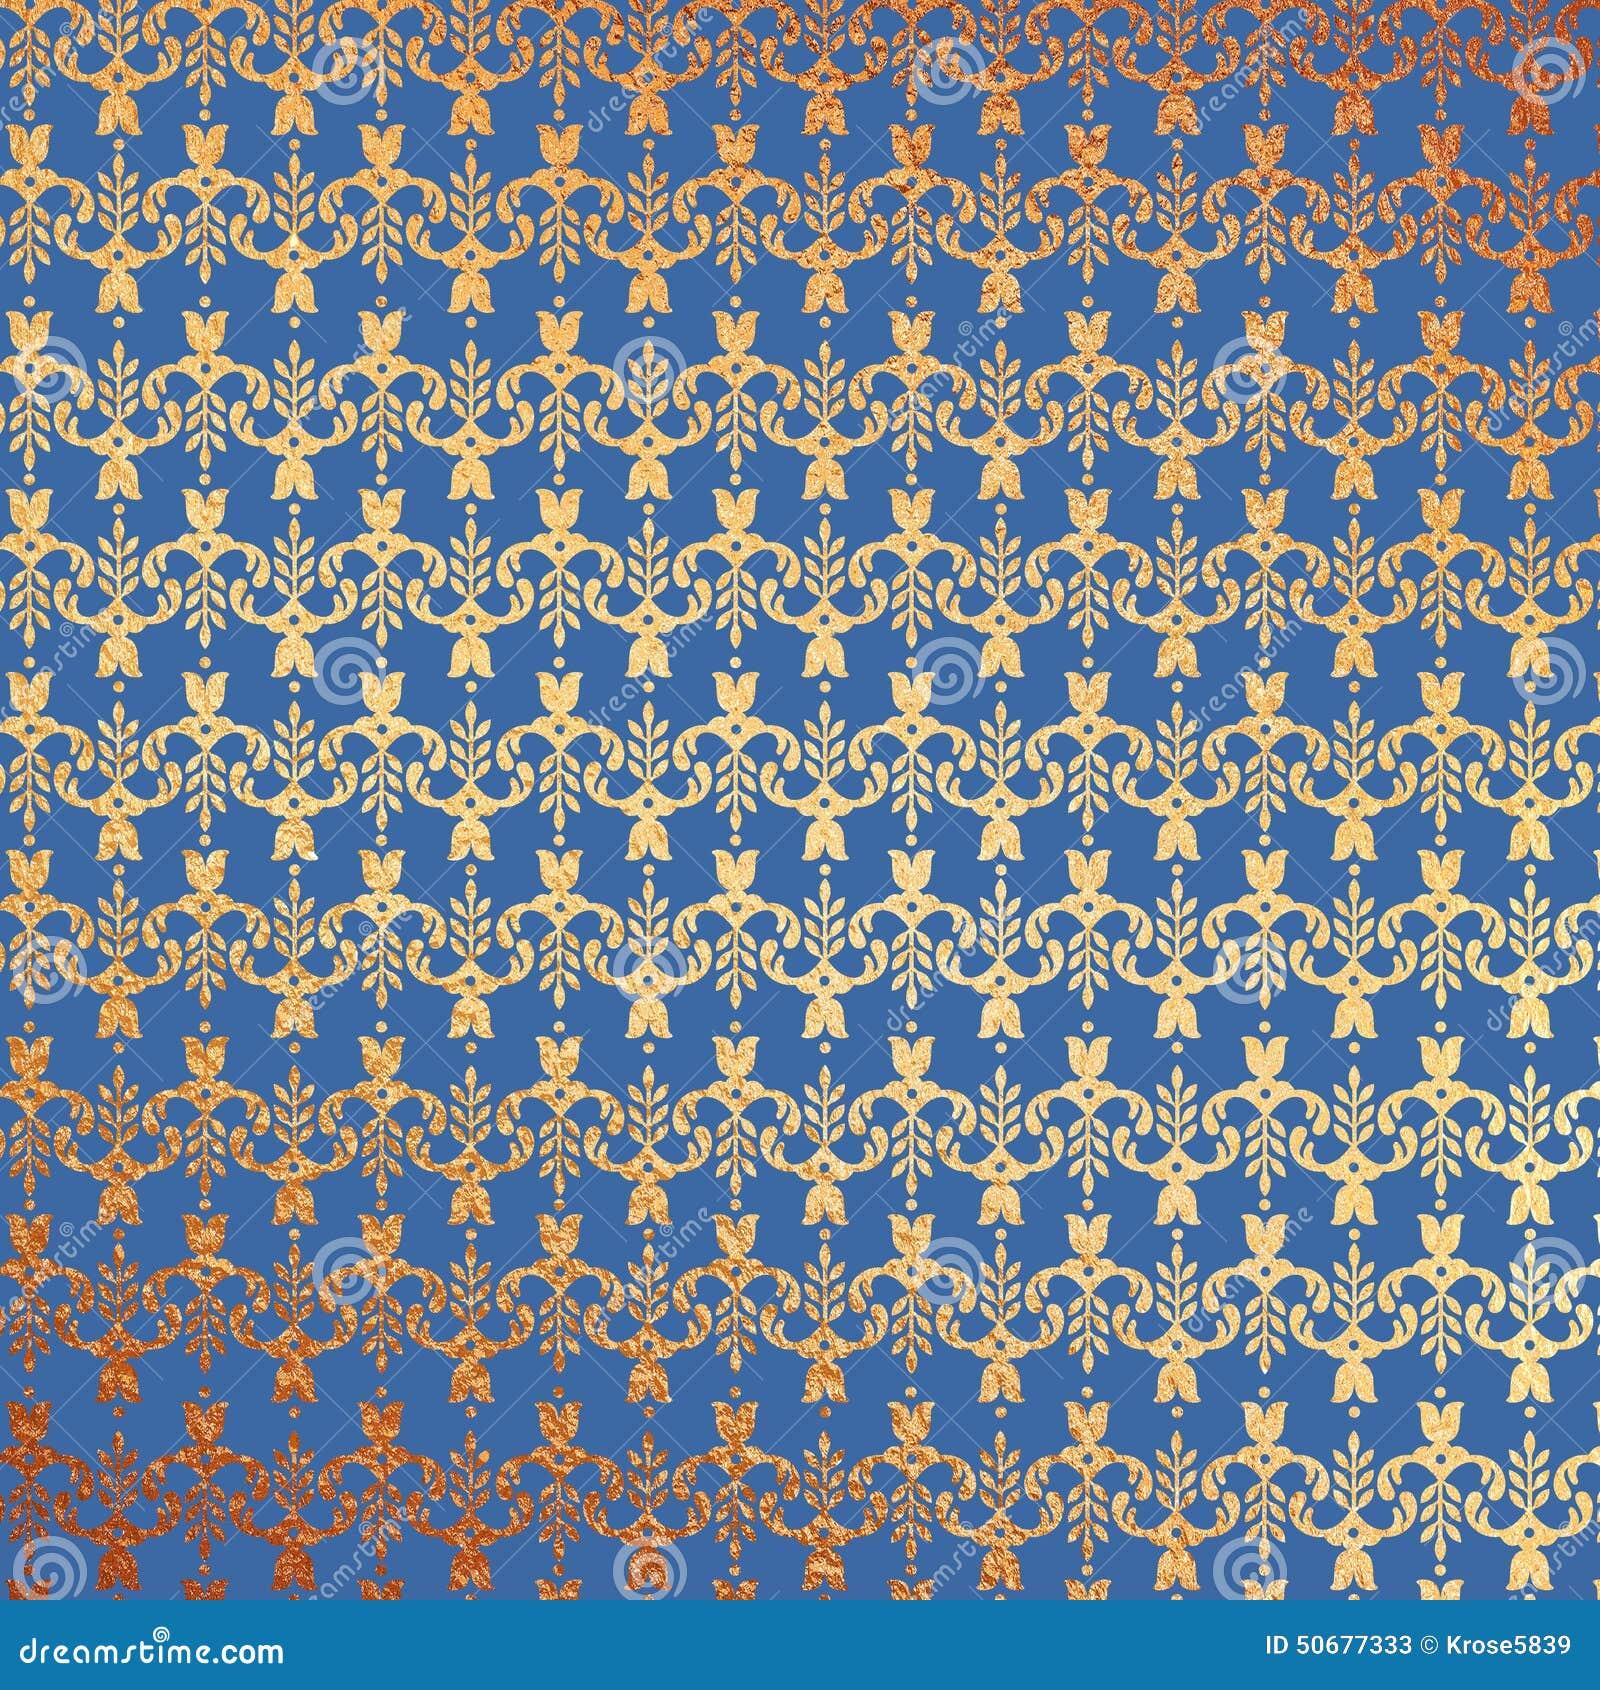 Blue And Gold Foil Floral Background